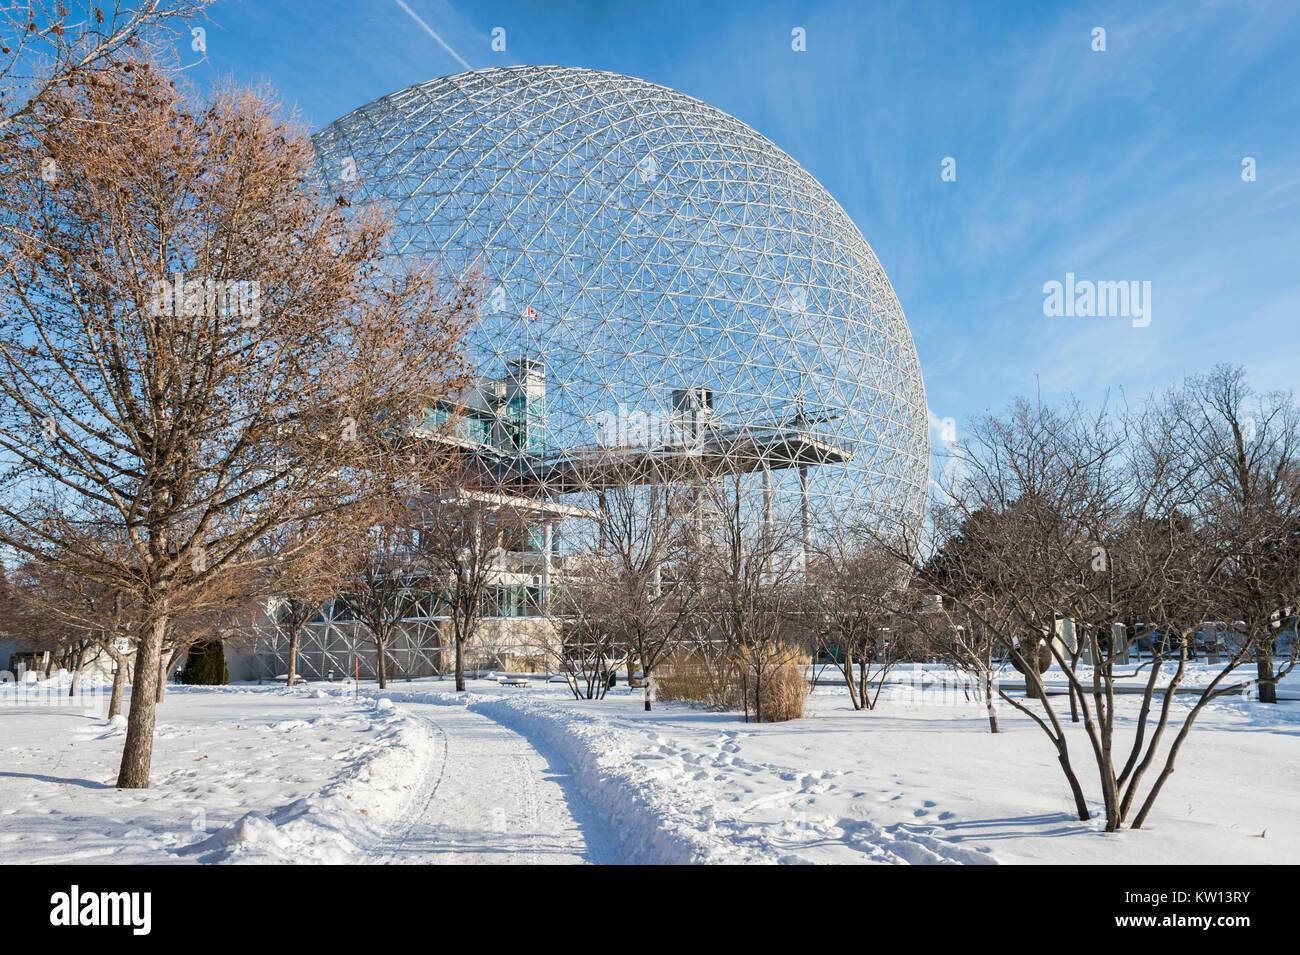 Montreal, CA - 28 December 2017: Biosphere in Parc Jean Drapeau, in winter - Stock Image